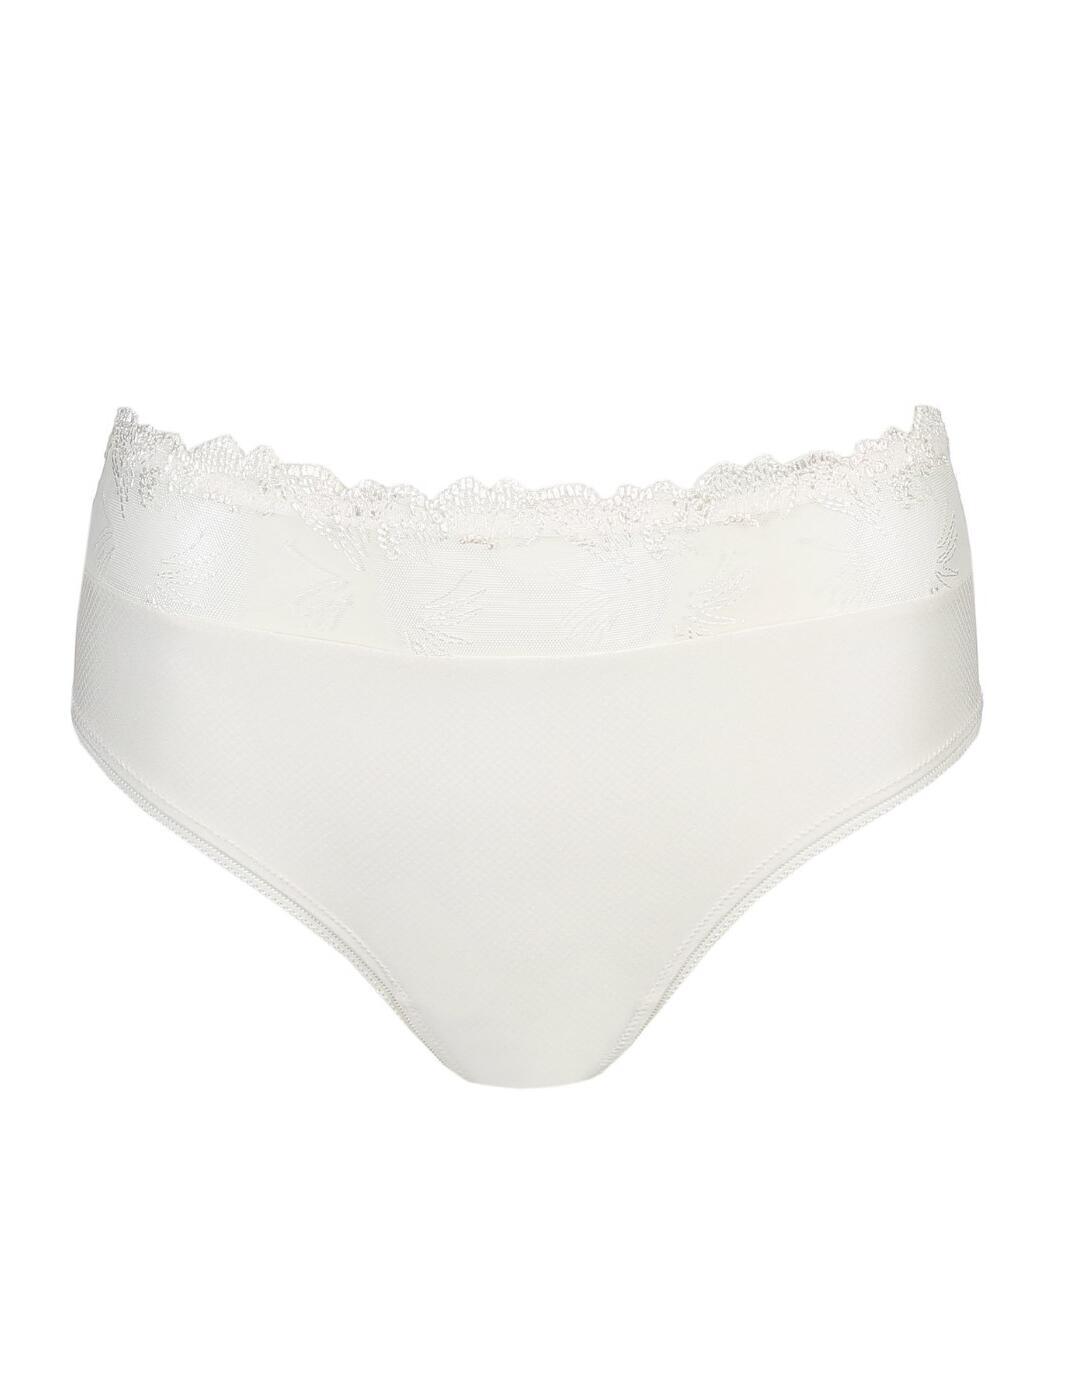 Prima-Donna-Panache-Full-Briefs-Knickers-0562921-Nouvelle-robe-de-luxe-lingerie miniature 4